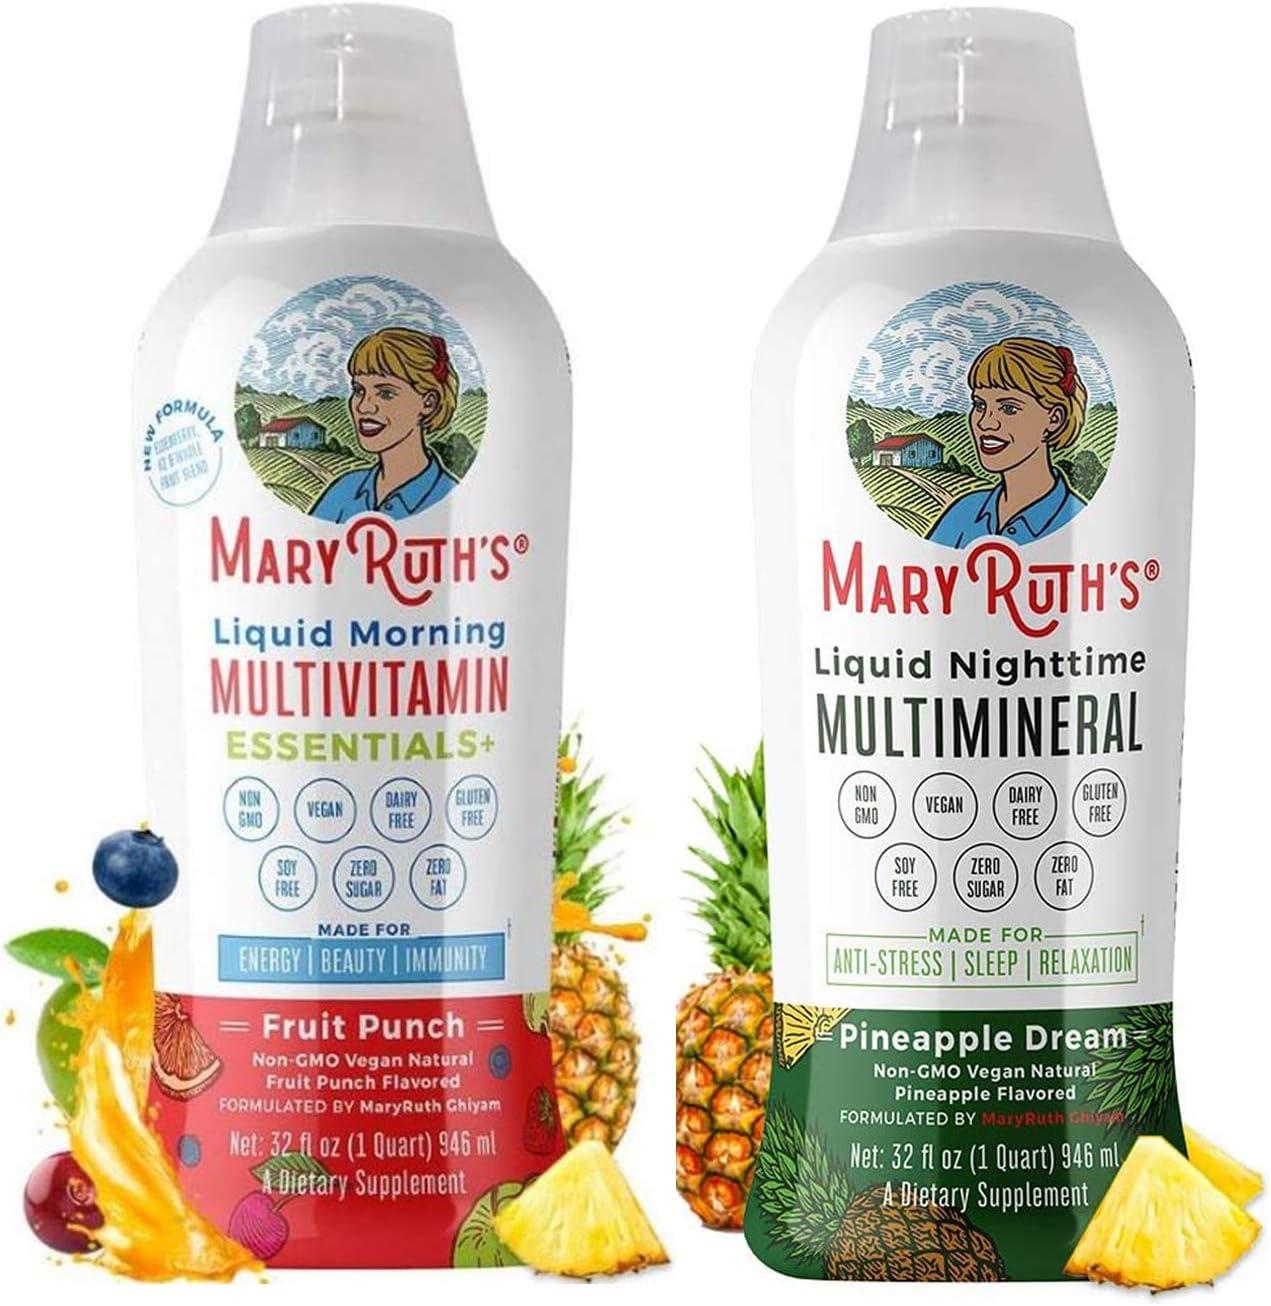 Morning Liquid Multivitamin & Liquid Sleep Multimineral Bundle by MaryRuth's | Morning Liquid Multivitamin (Fruit Punch), 32oz | Liquid Sleep Multimineral (Pineapple), 32oz | Vegan, Non-GMO